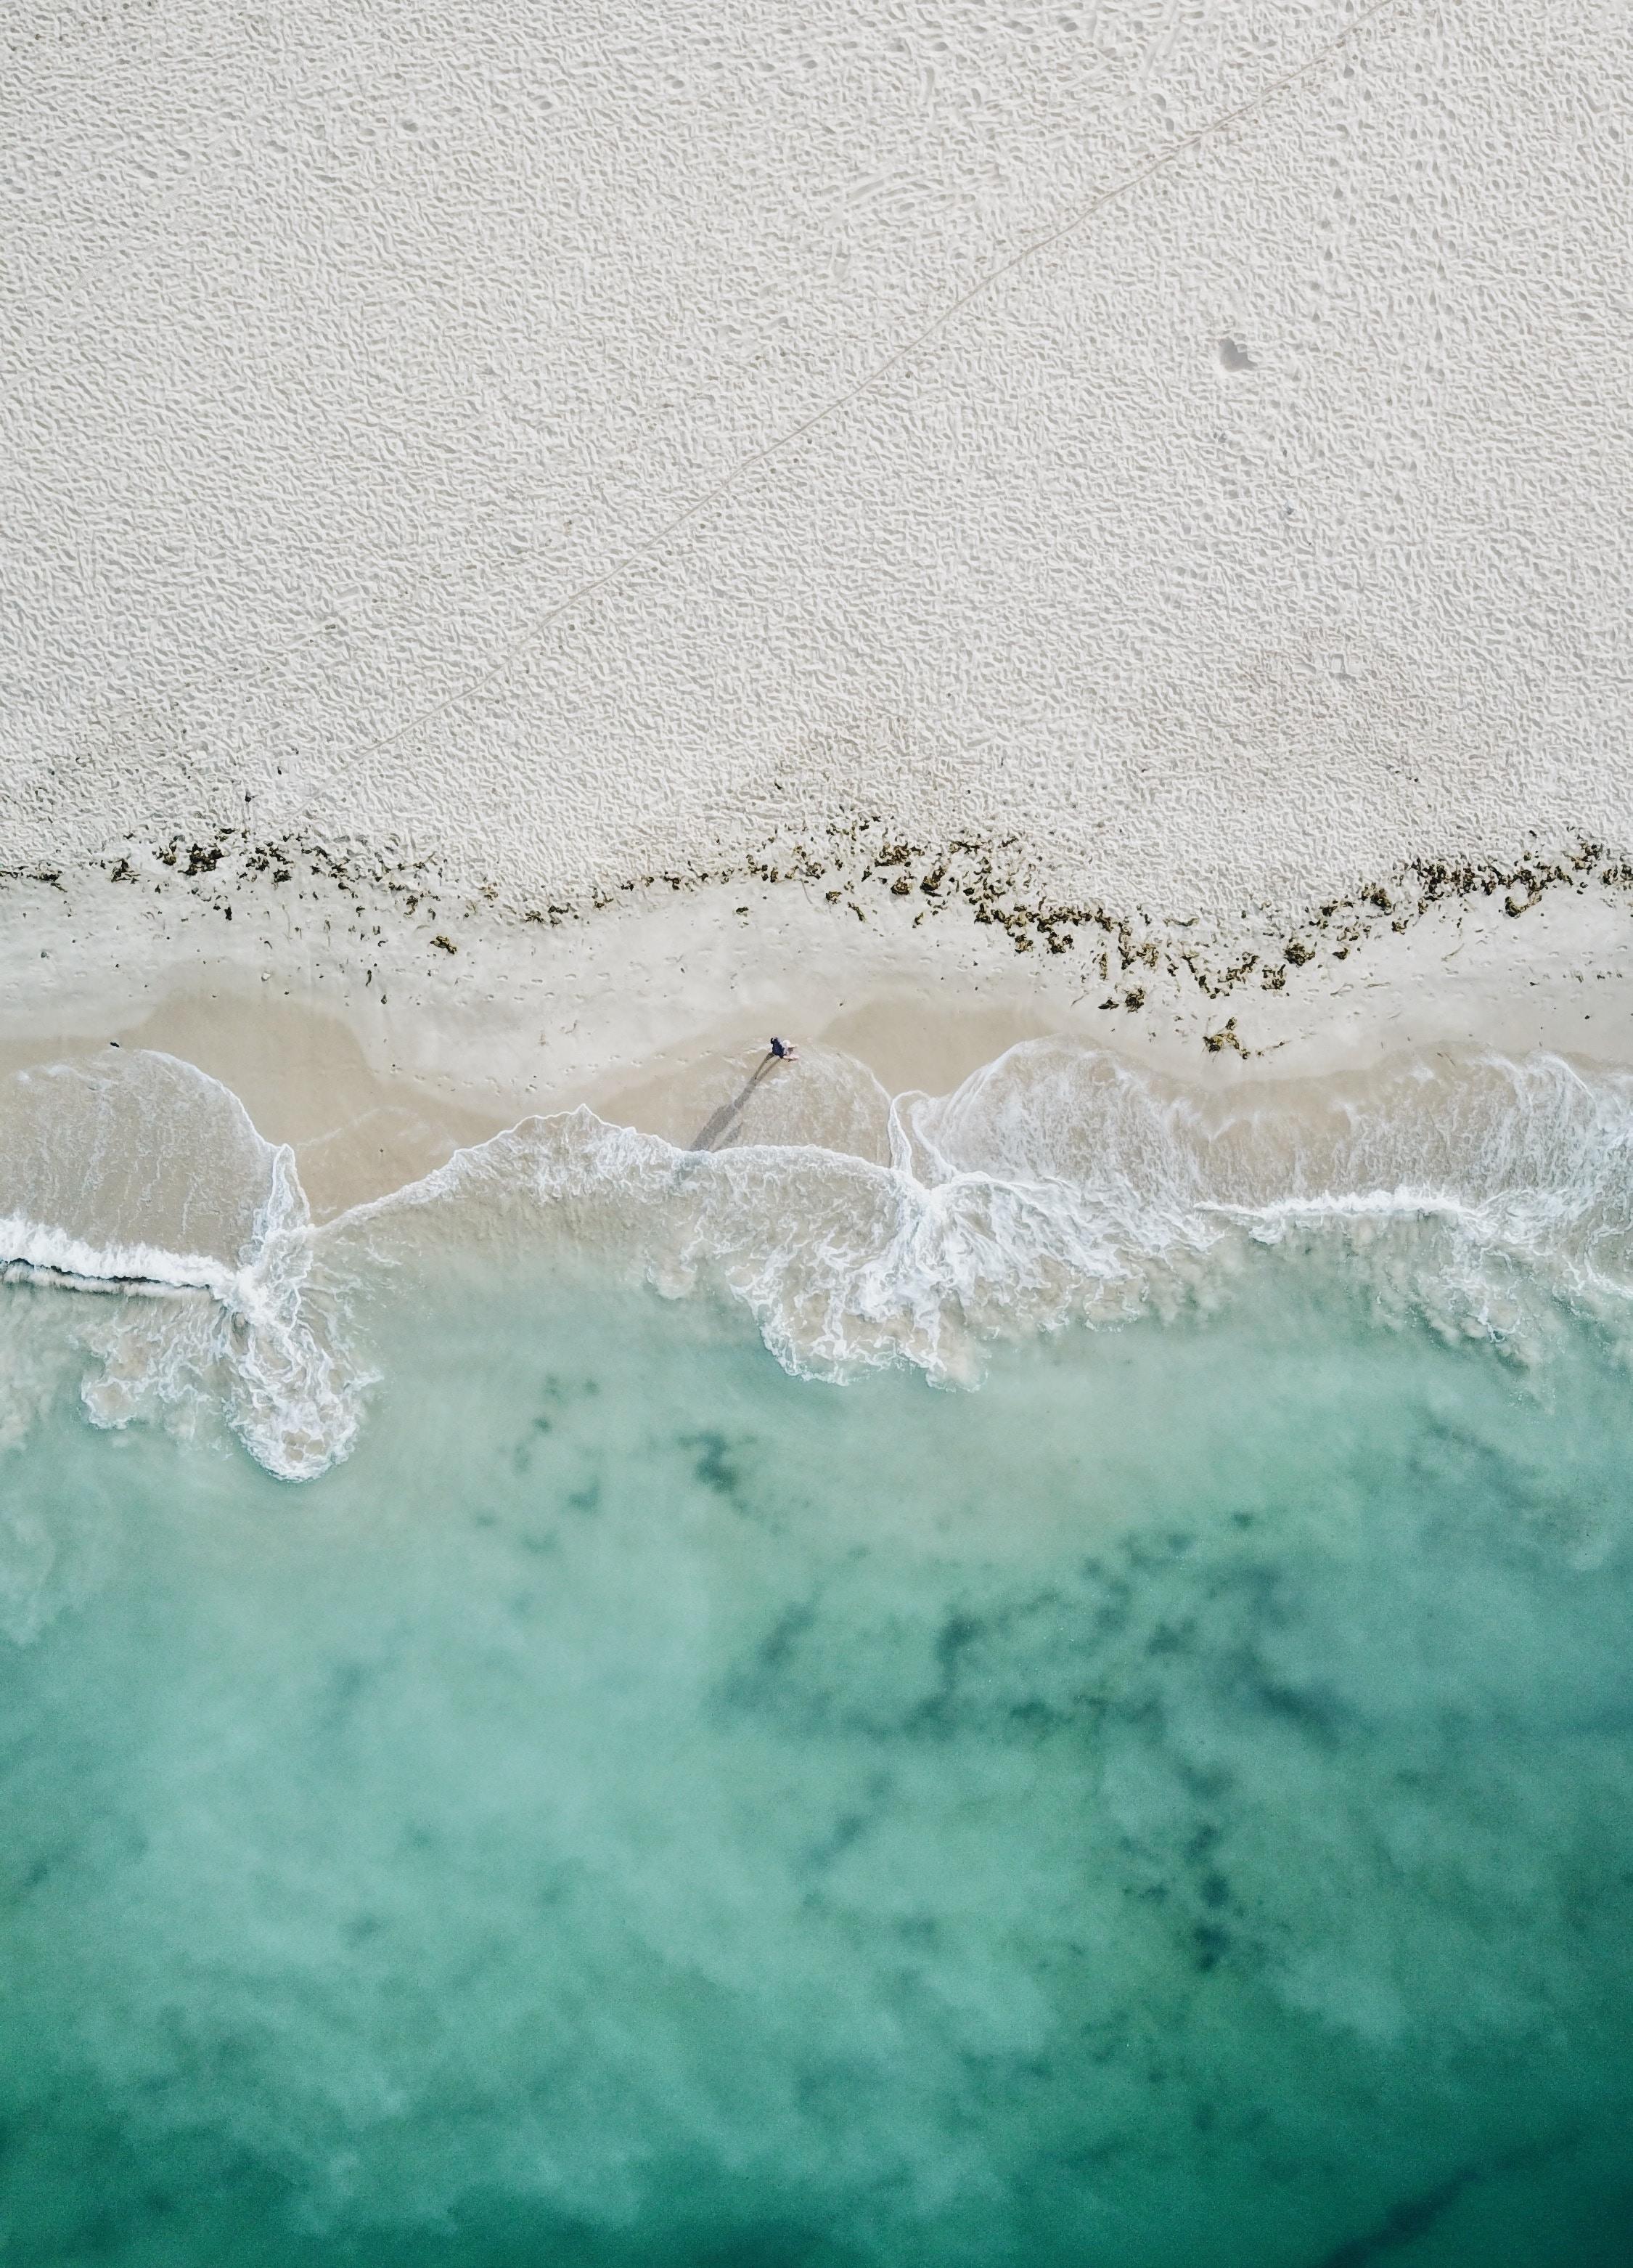 bird's eye photography of person standing on coastline